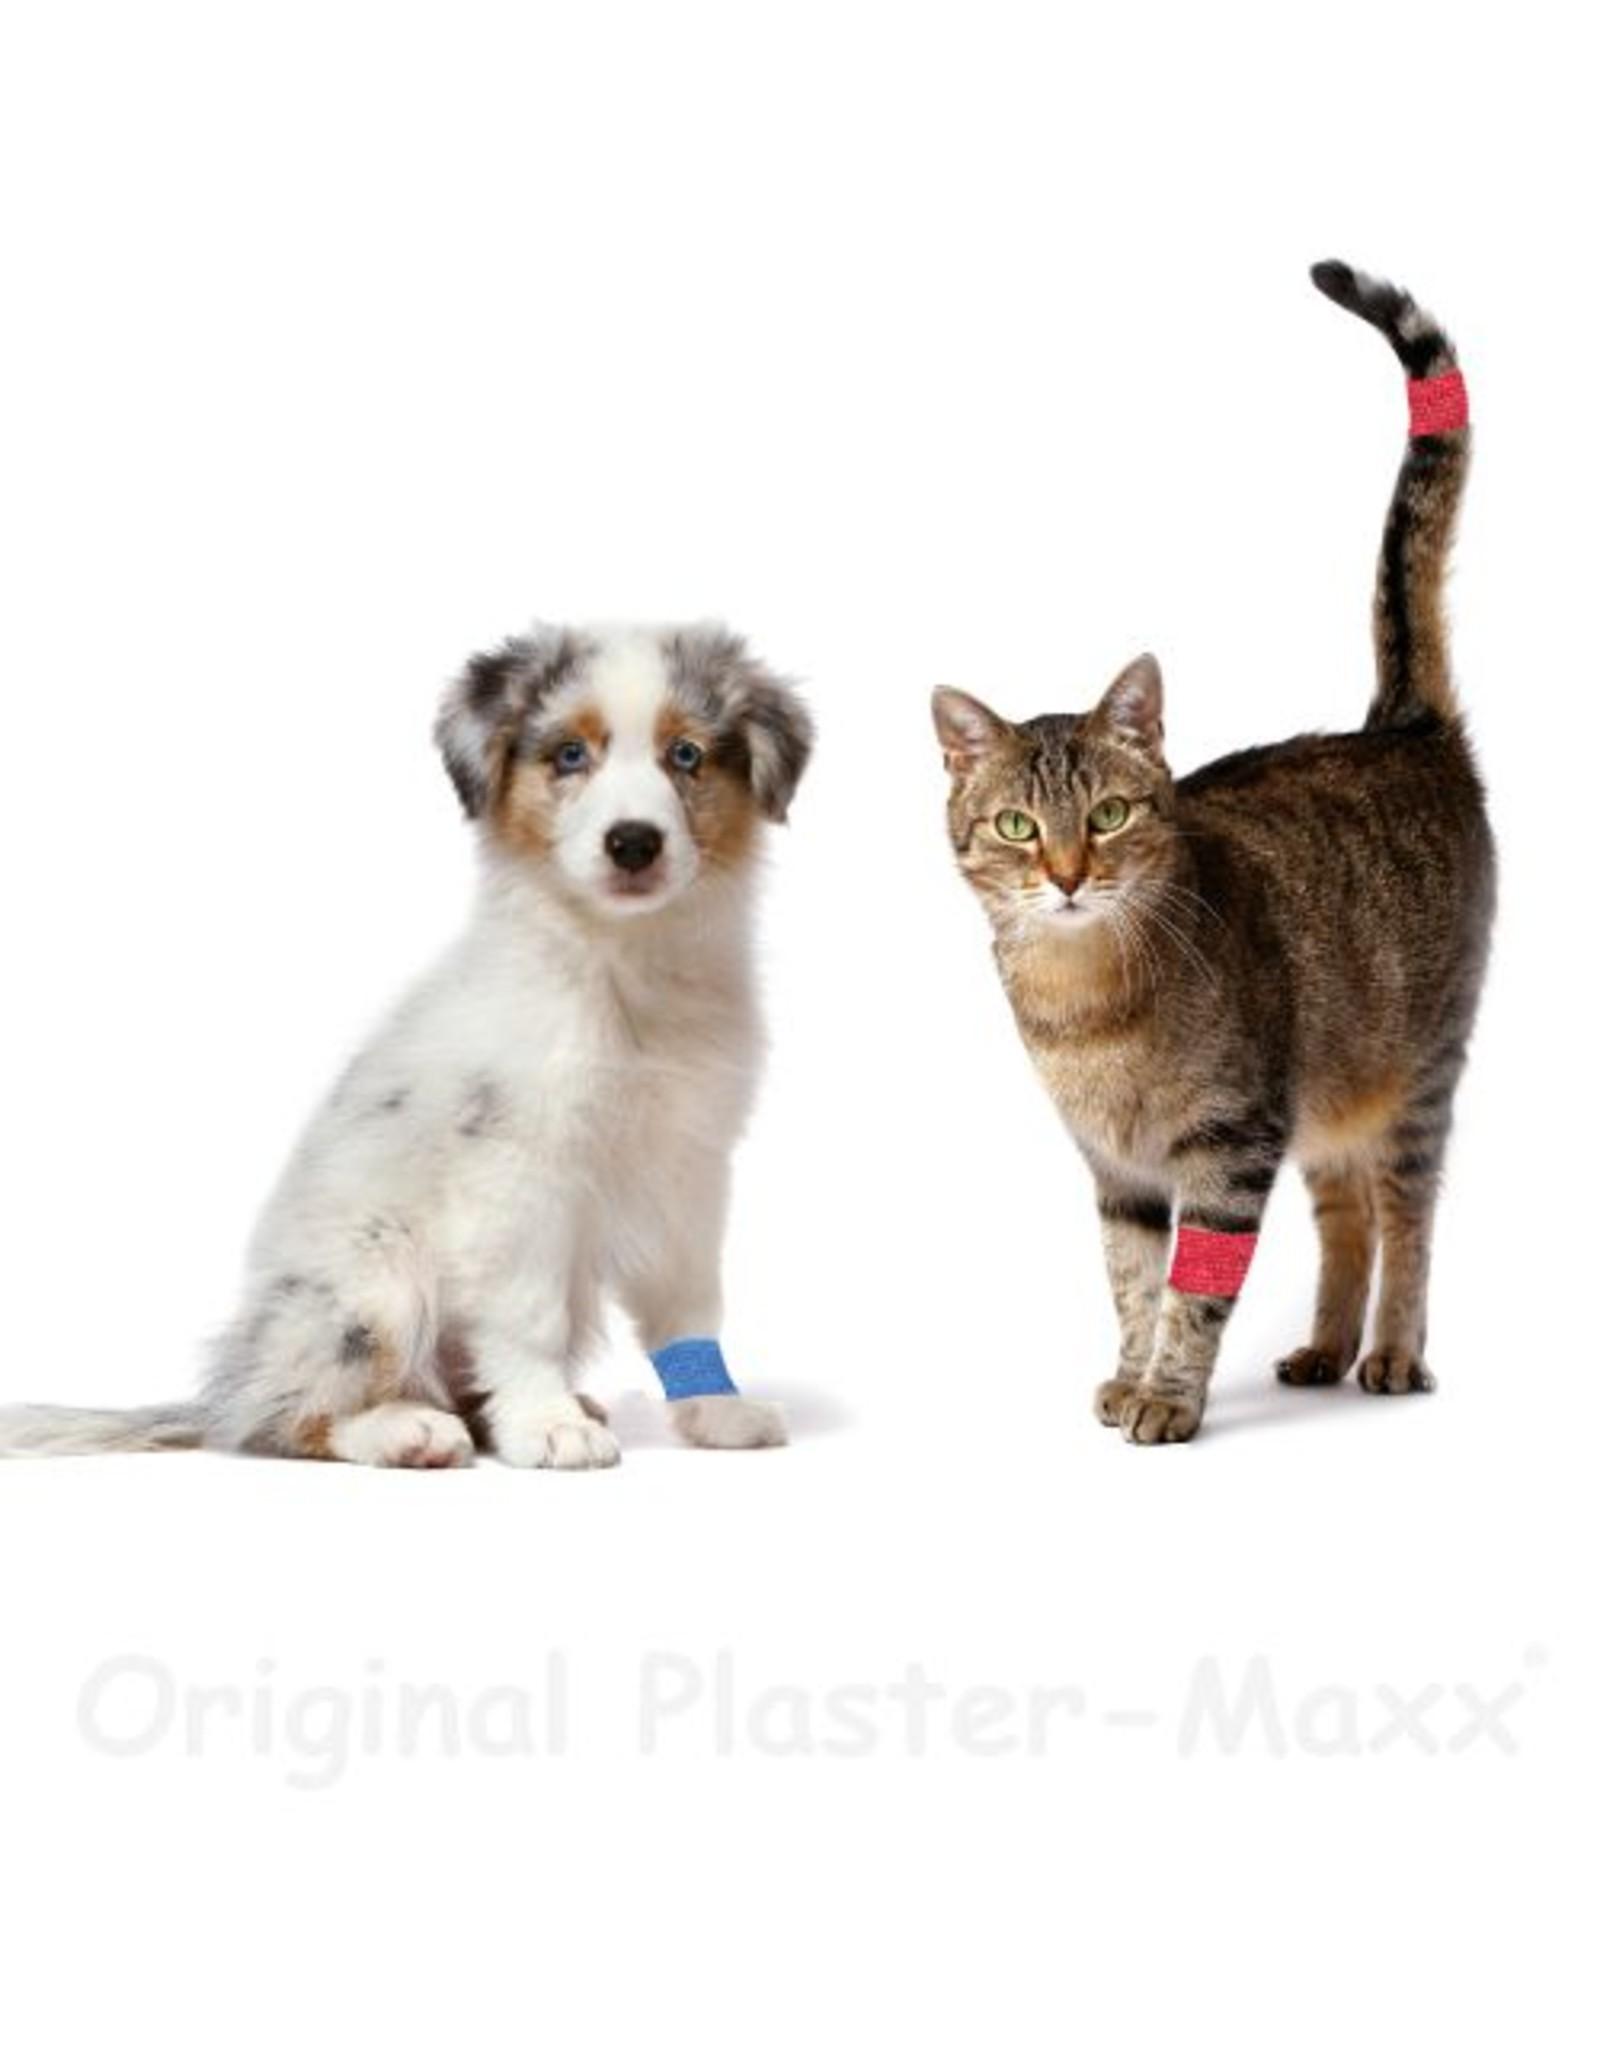 Plaster-Maxx Plaster-Maxx - Haut